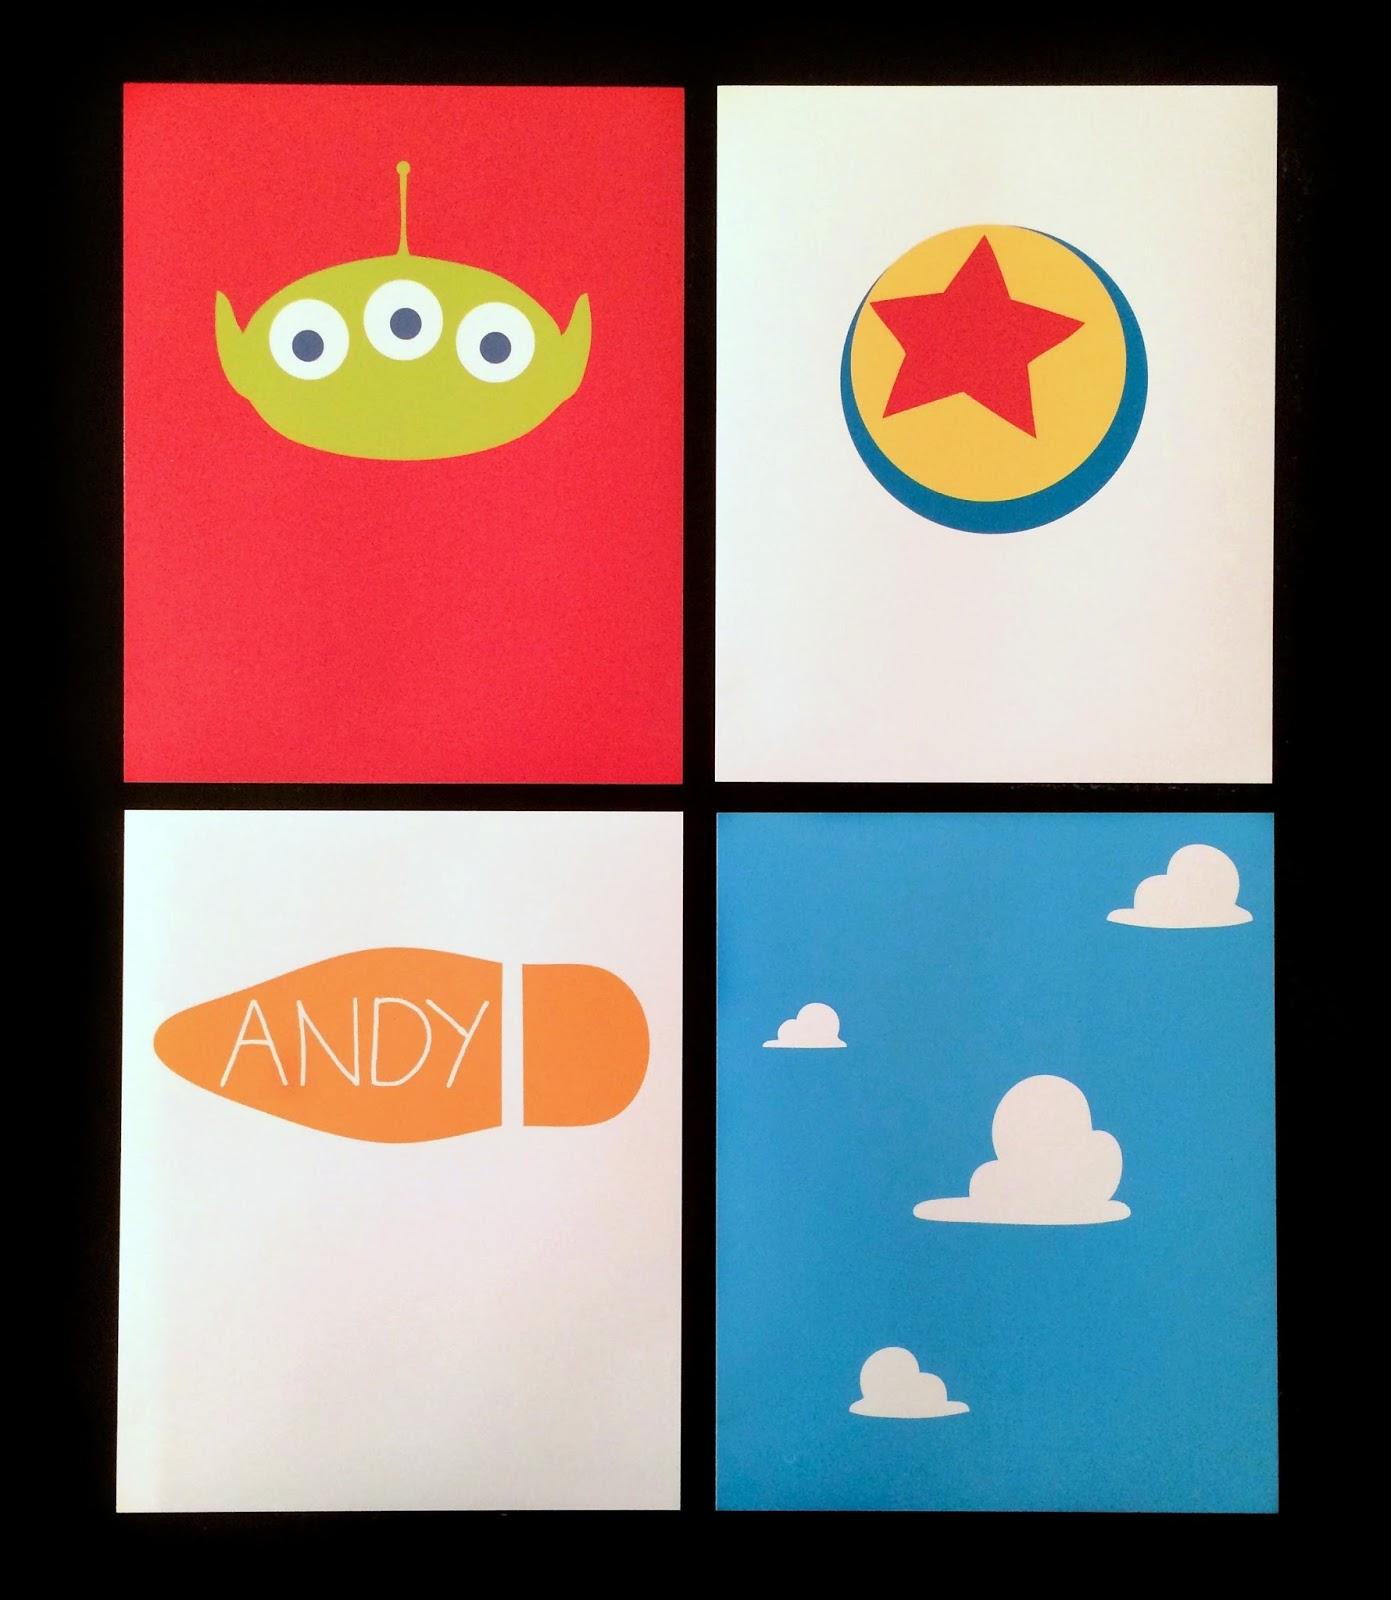 Dan the pixar fan toy story minimal art prints for for Minimal art video